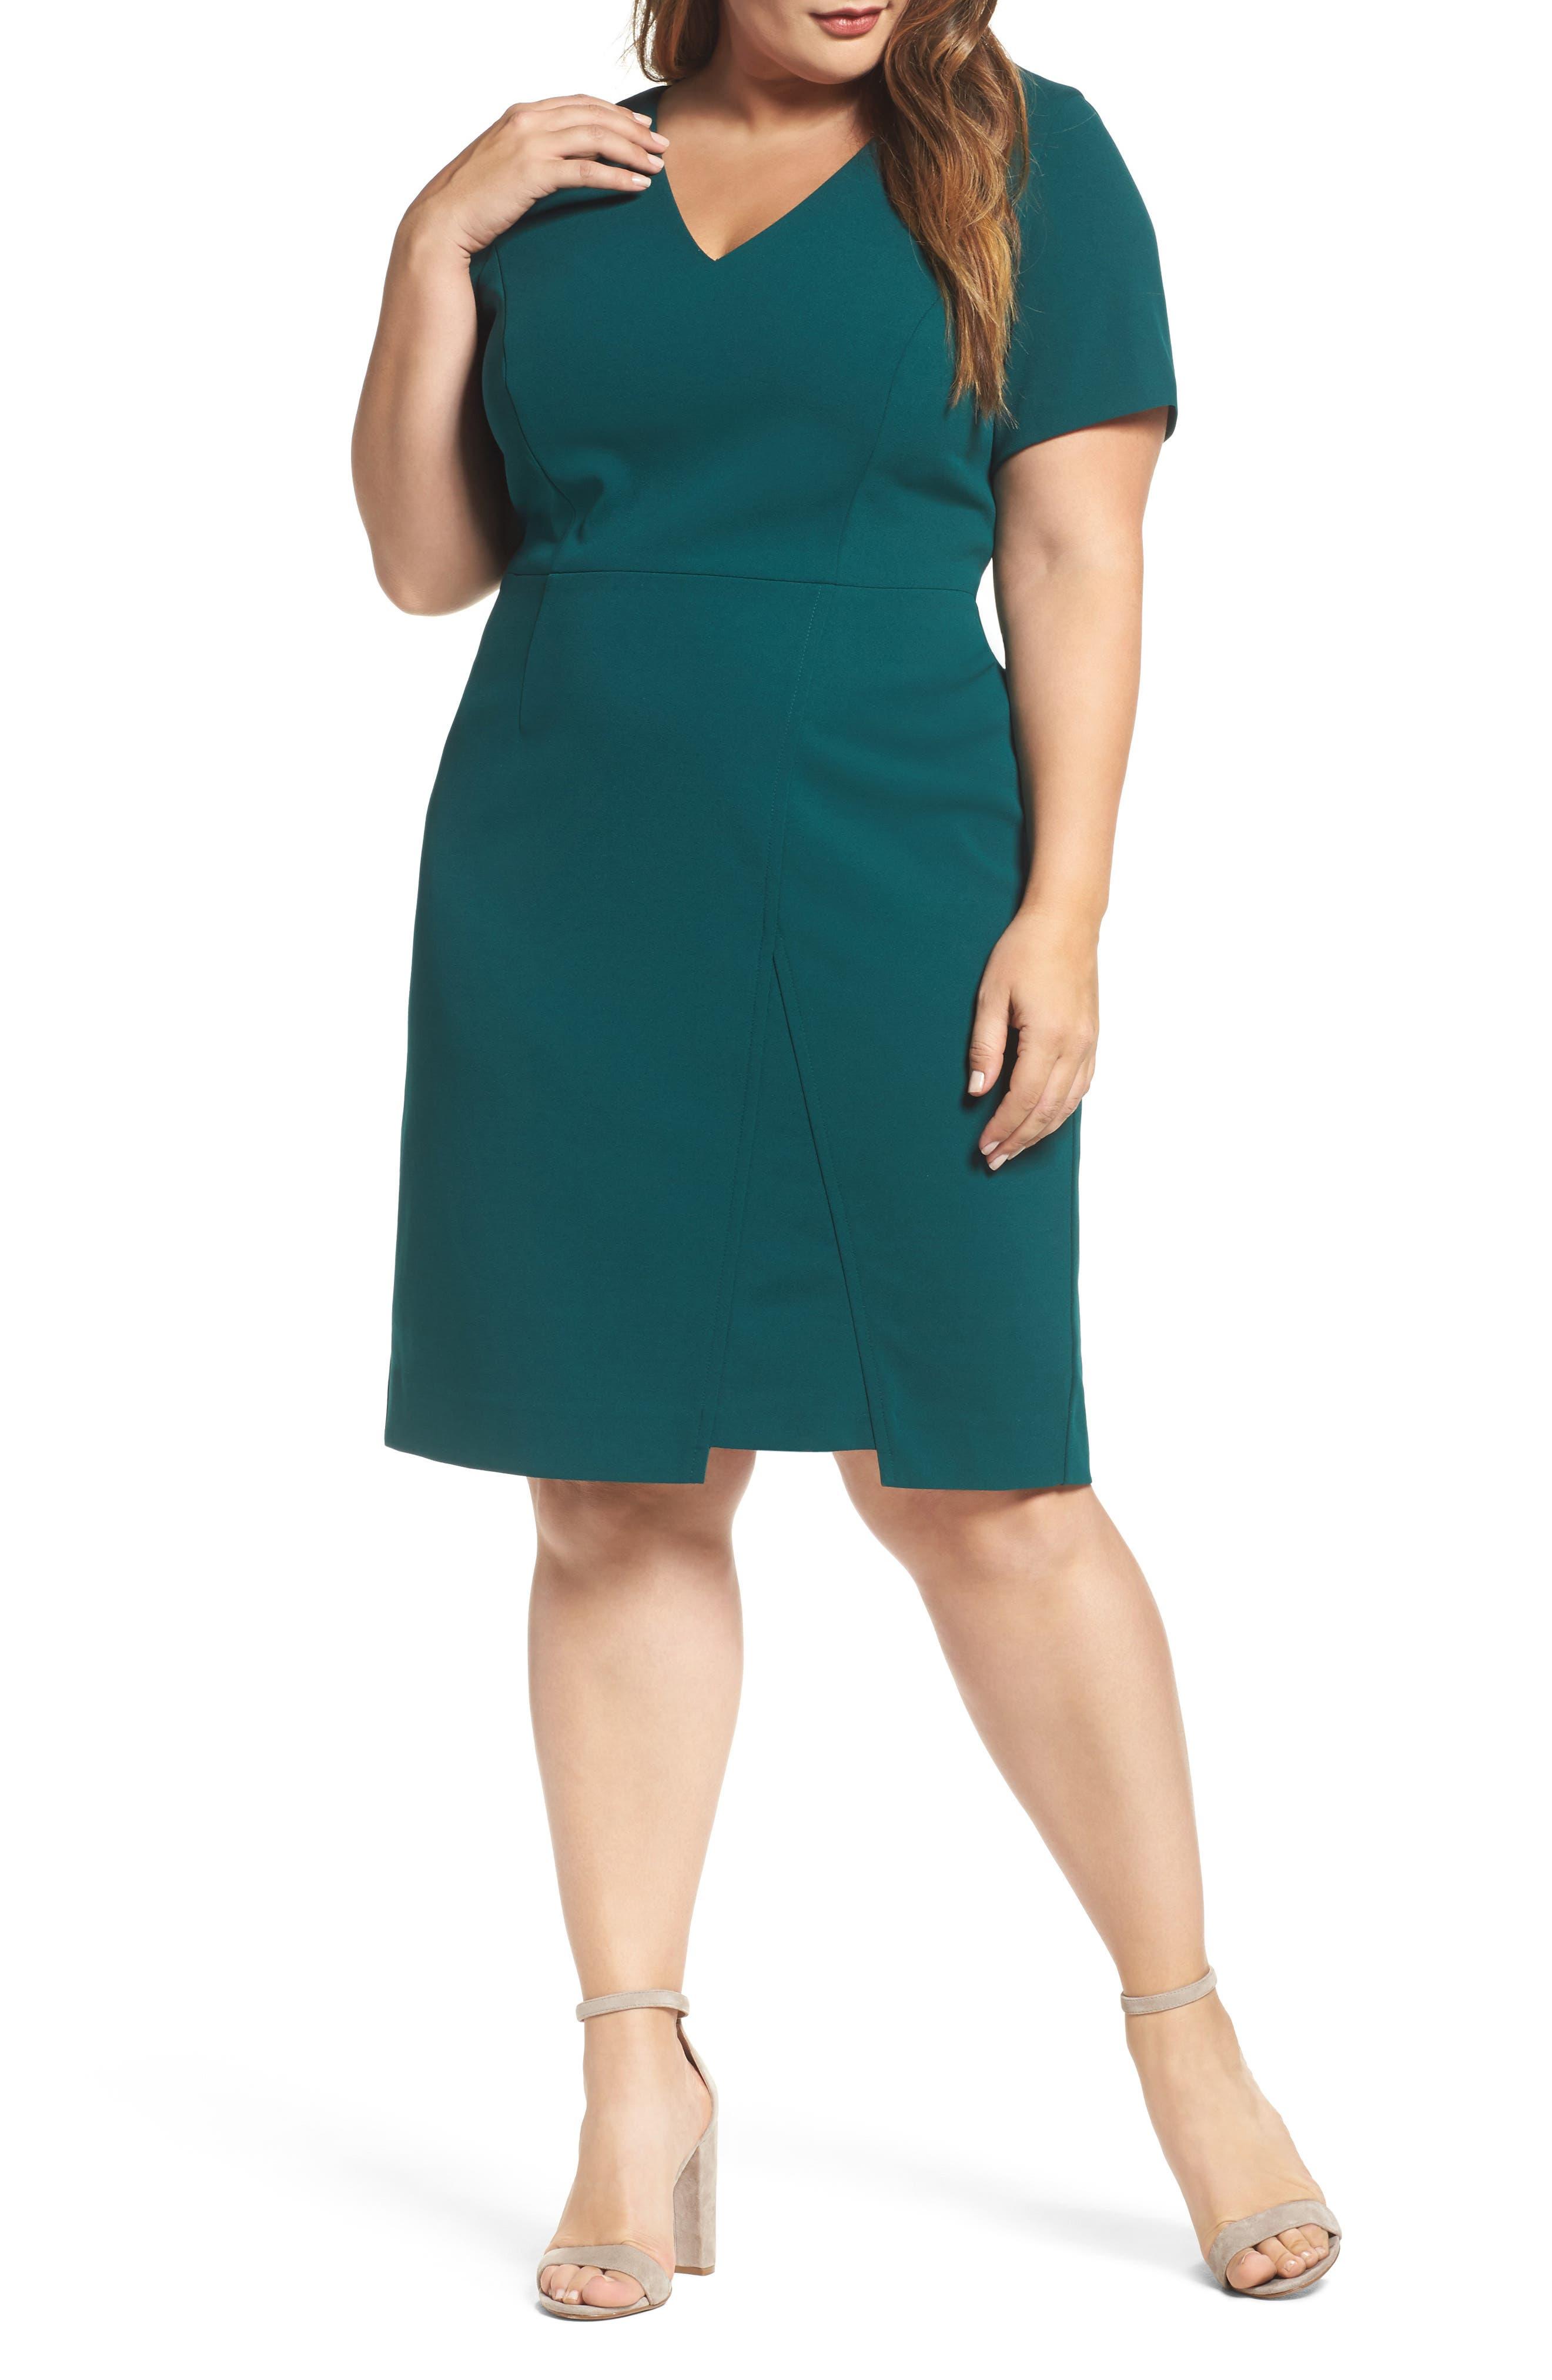 Main Image - Vince Camuto Scuba Crepe Sheath Dress (Plus Size)